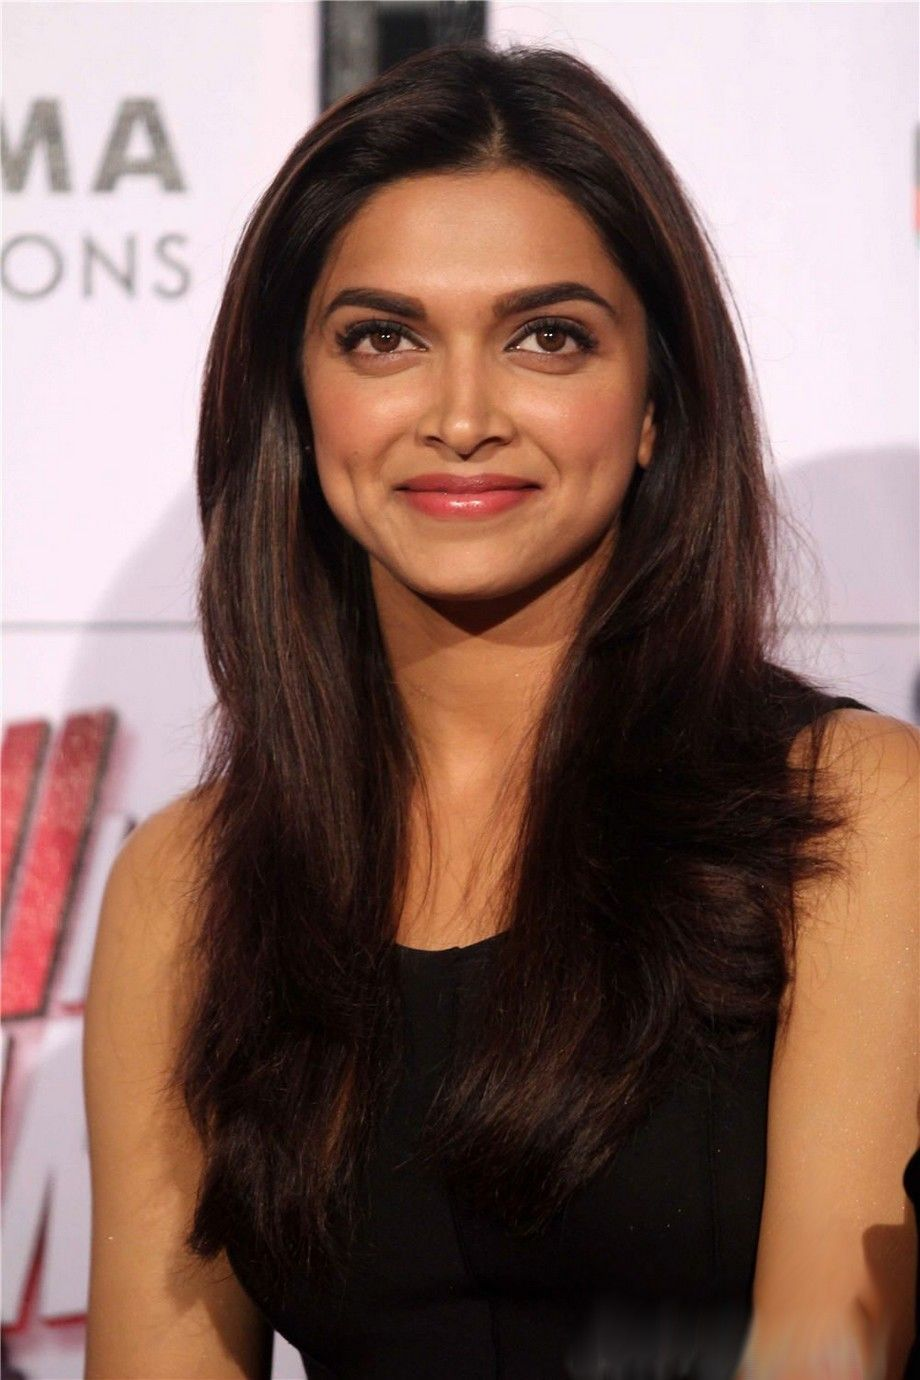 Deepika Padukone hair - Google Search | Deepika padukone ...